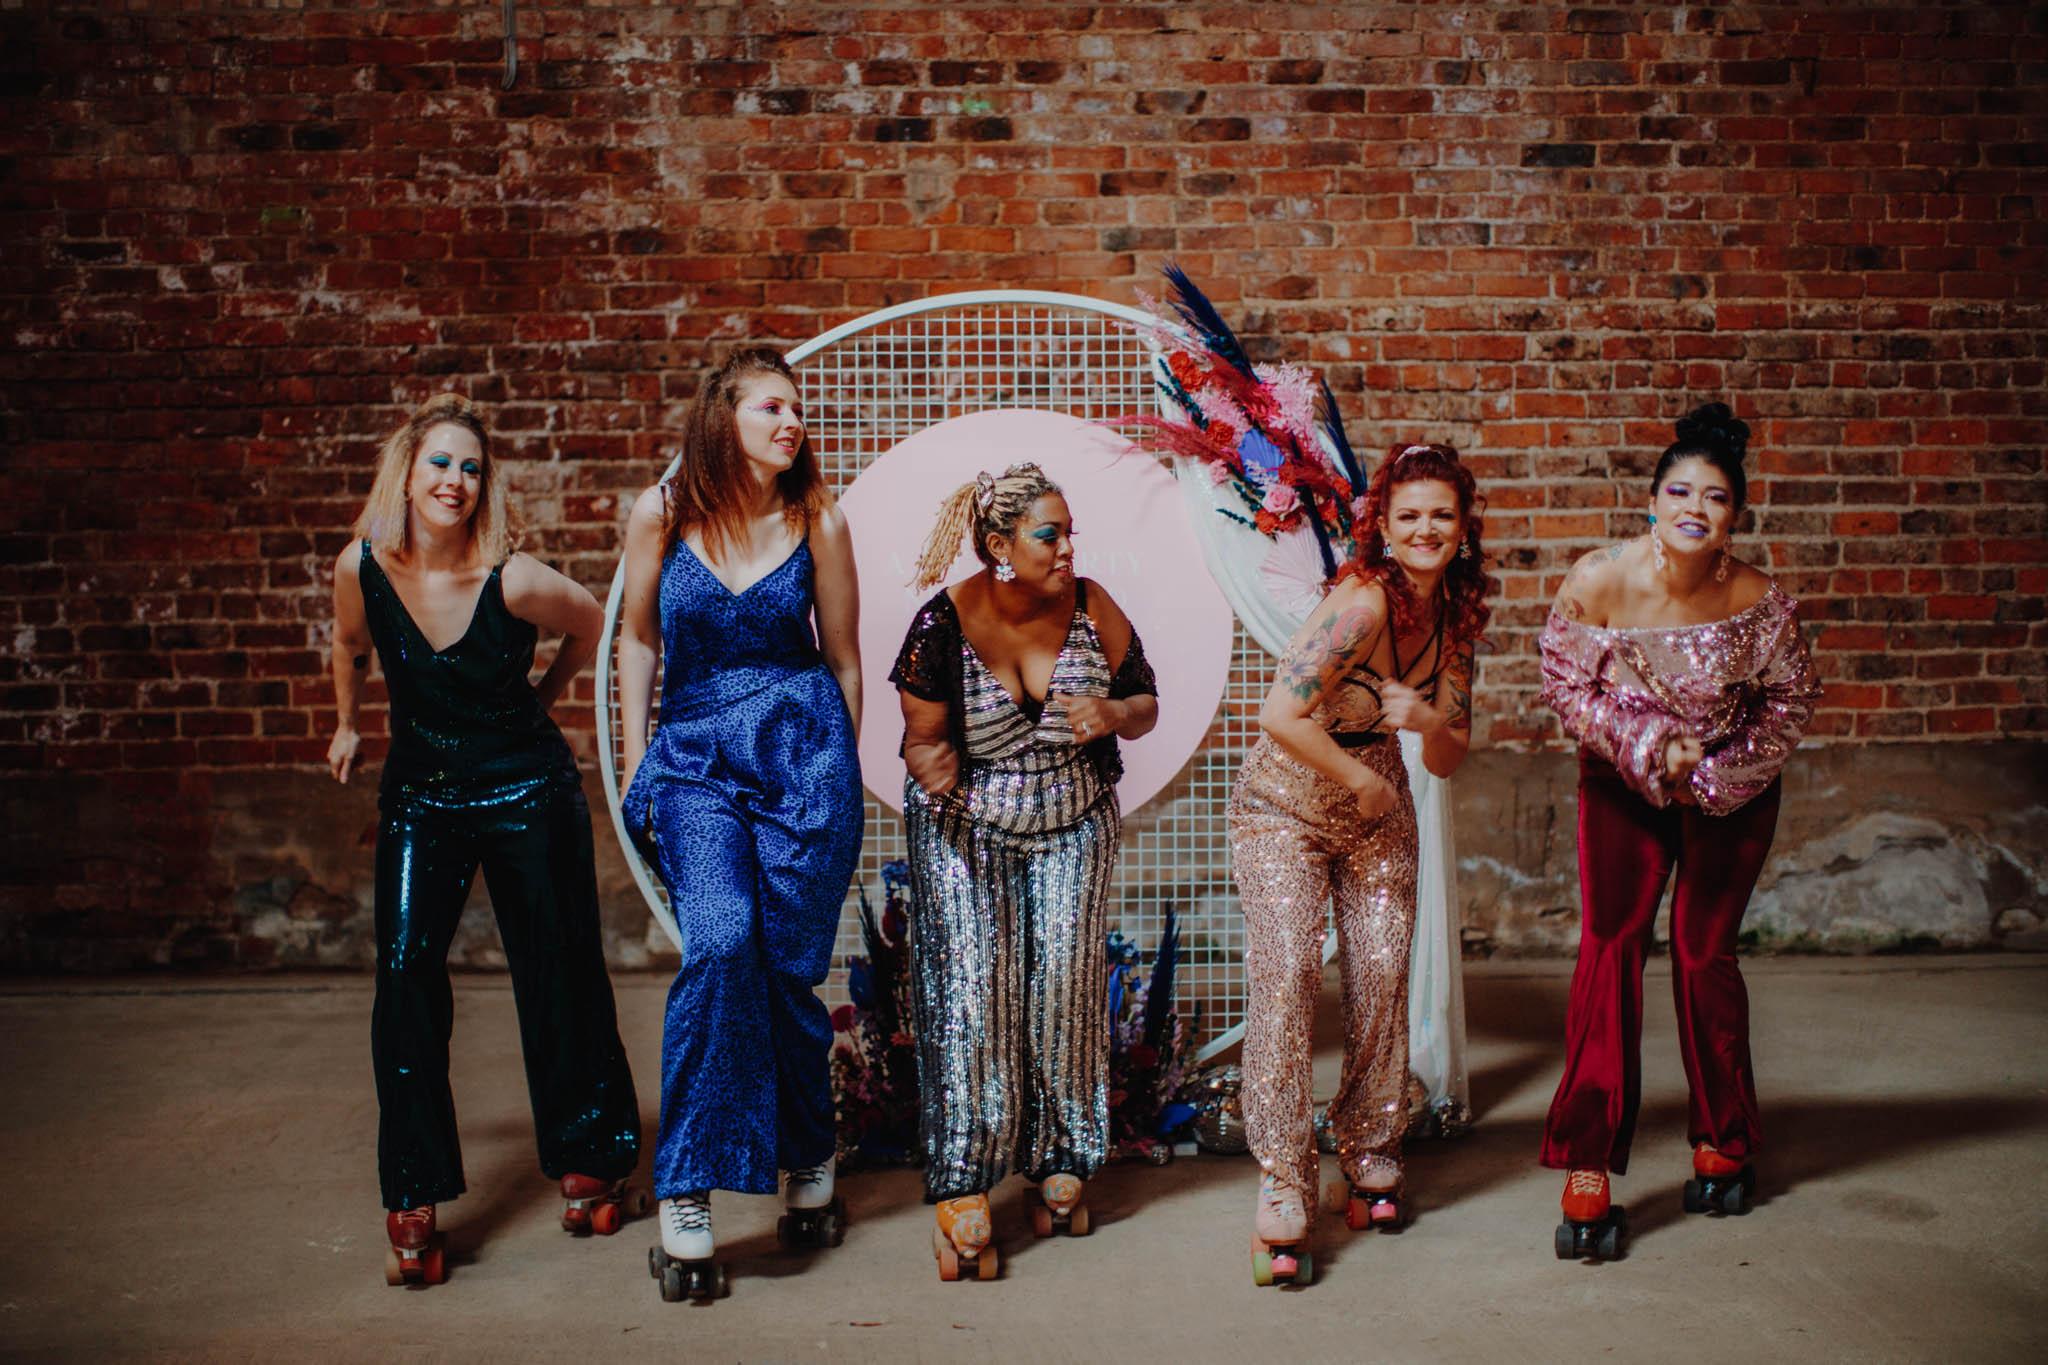 roller disco wedding - bridesmaids on roller skates - bridesmaid jumpsuits - unique bridesmaid ideas